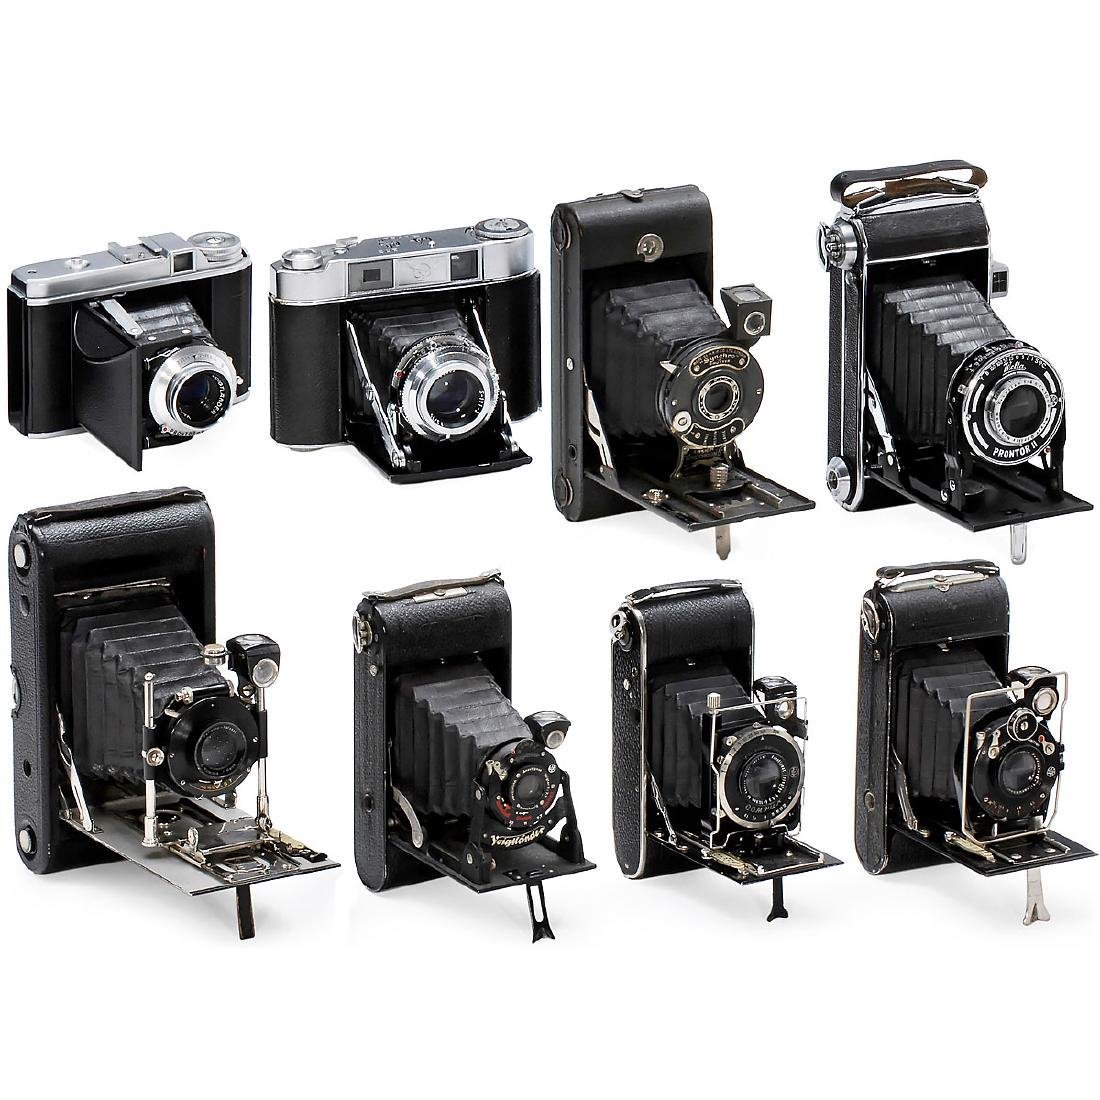 25 Rollfilm Cameras